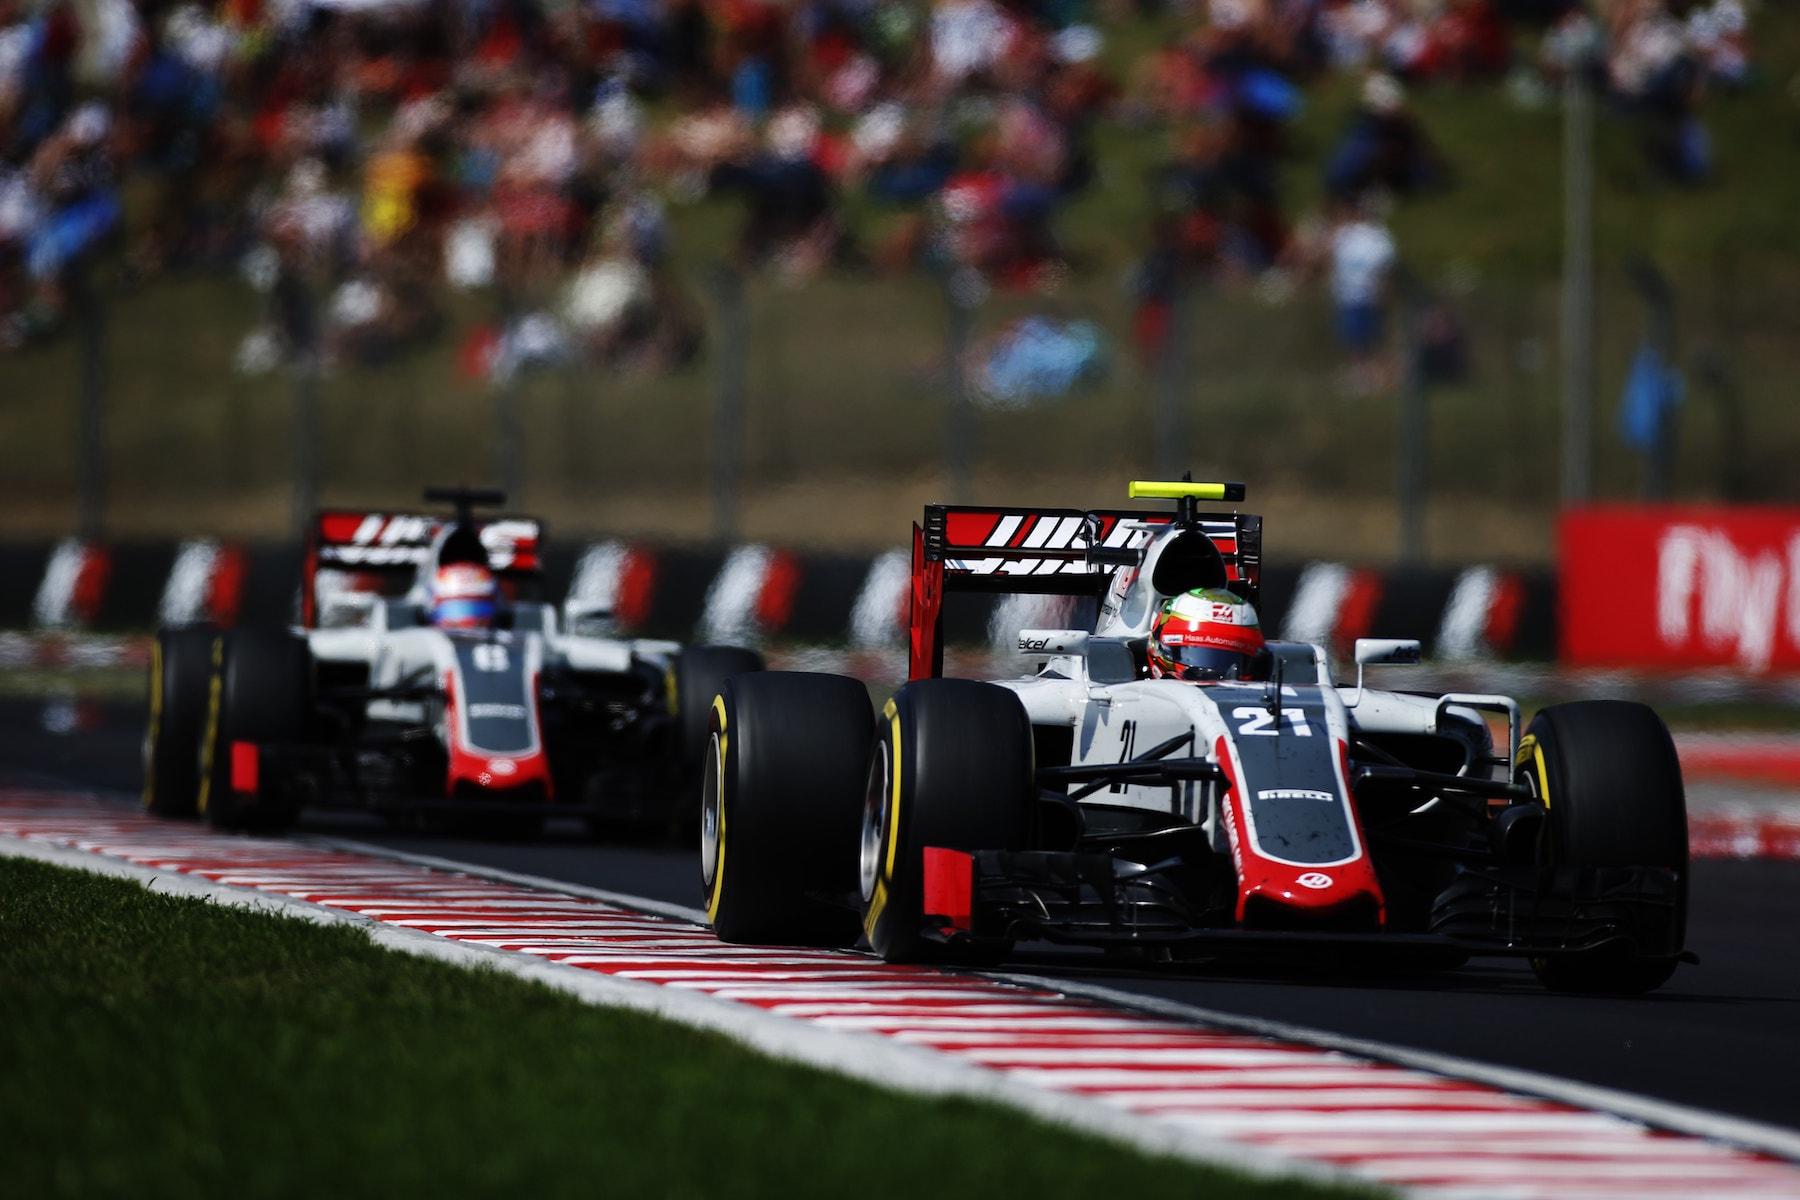 Salracing | Esteban Gutierrez | Haas F1 Team